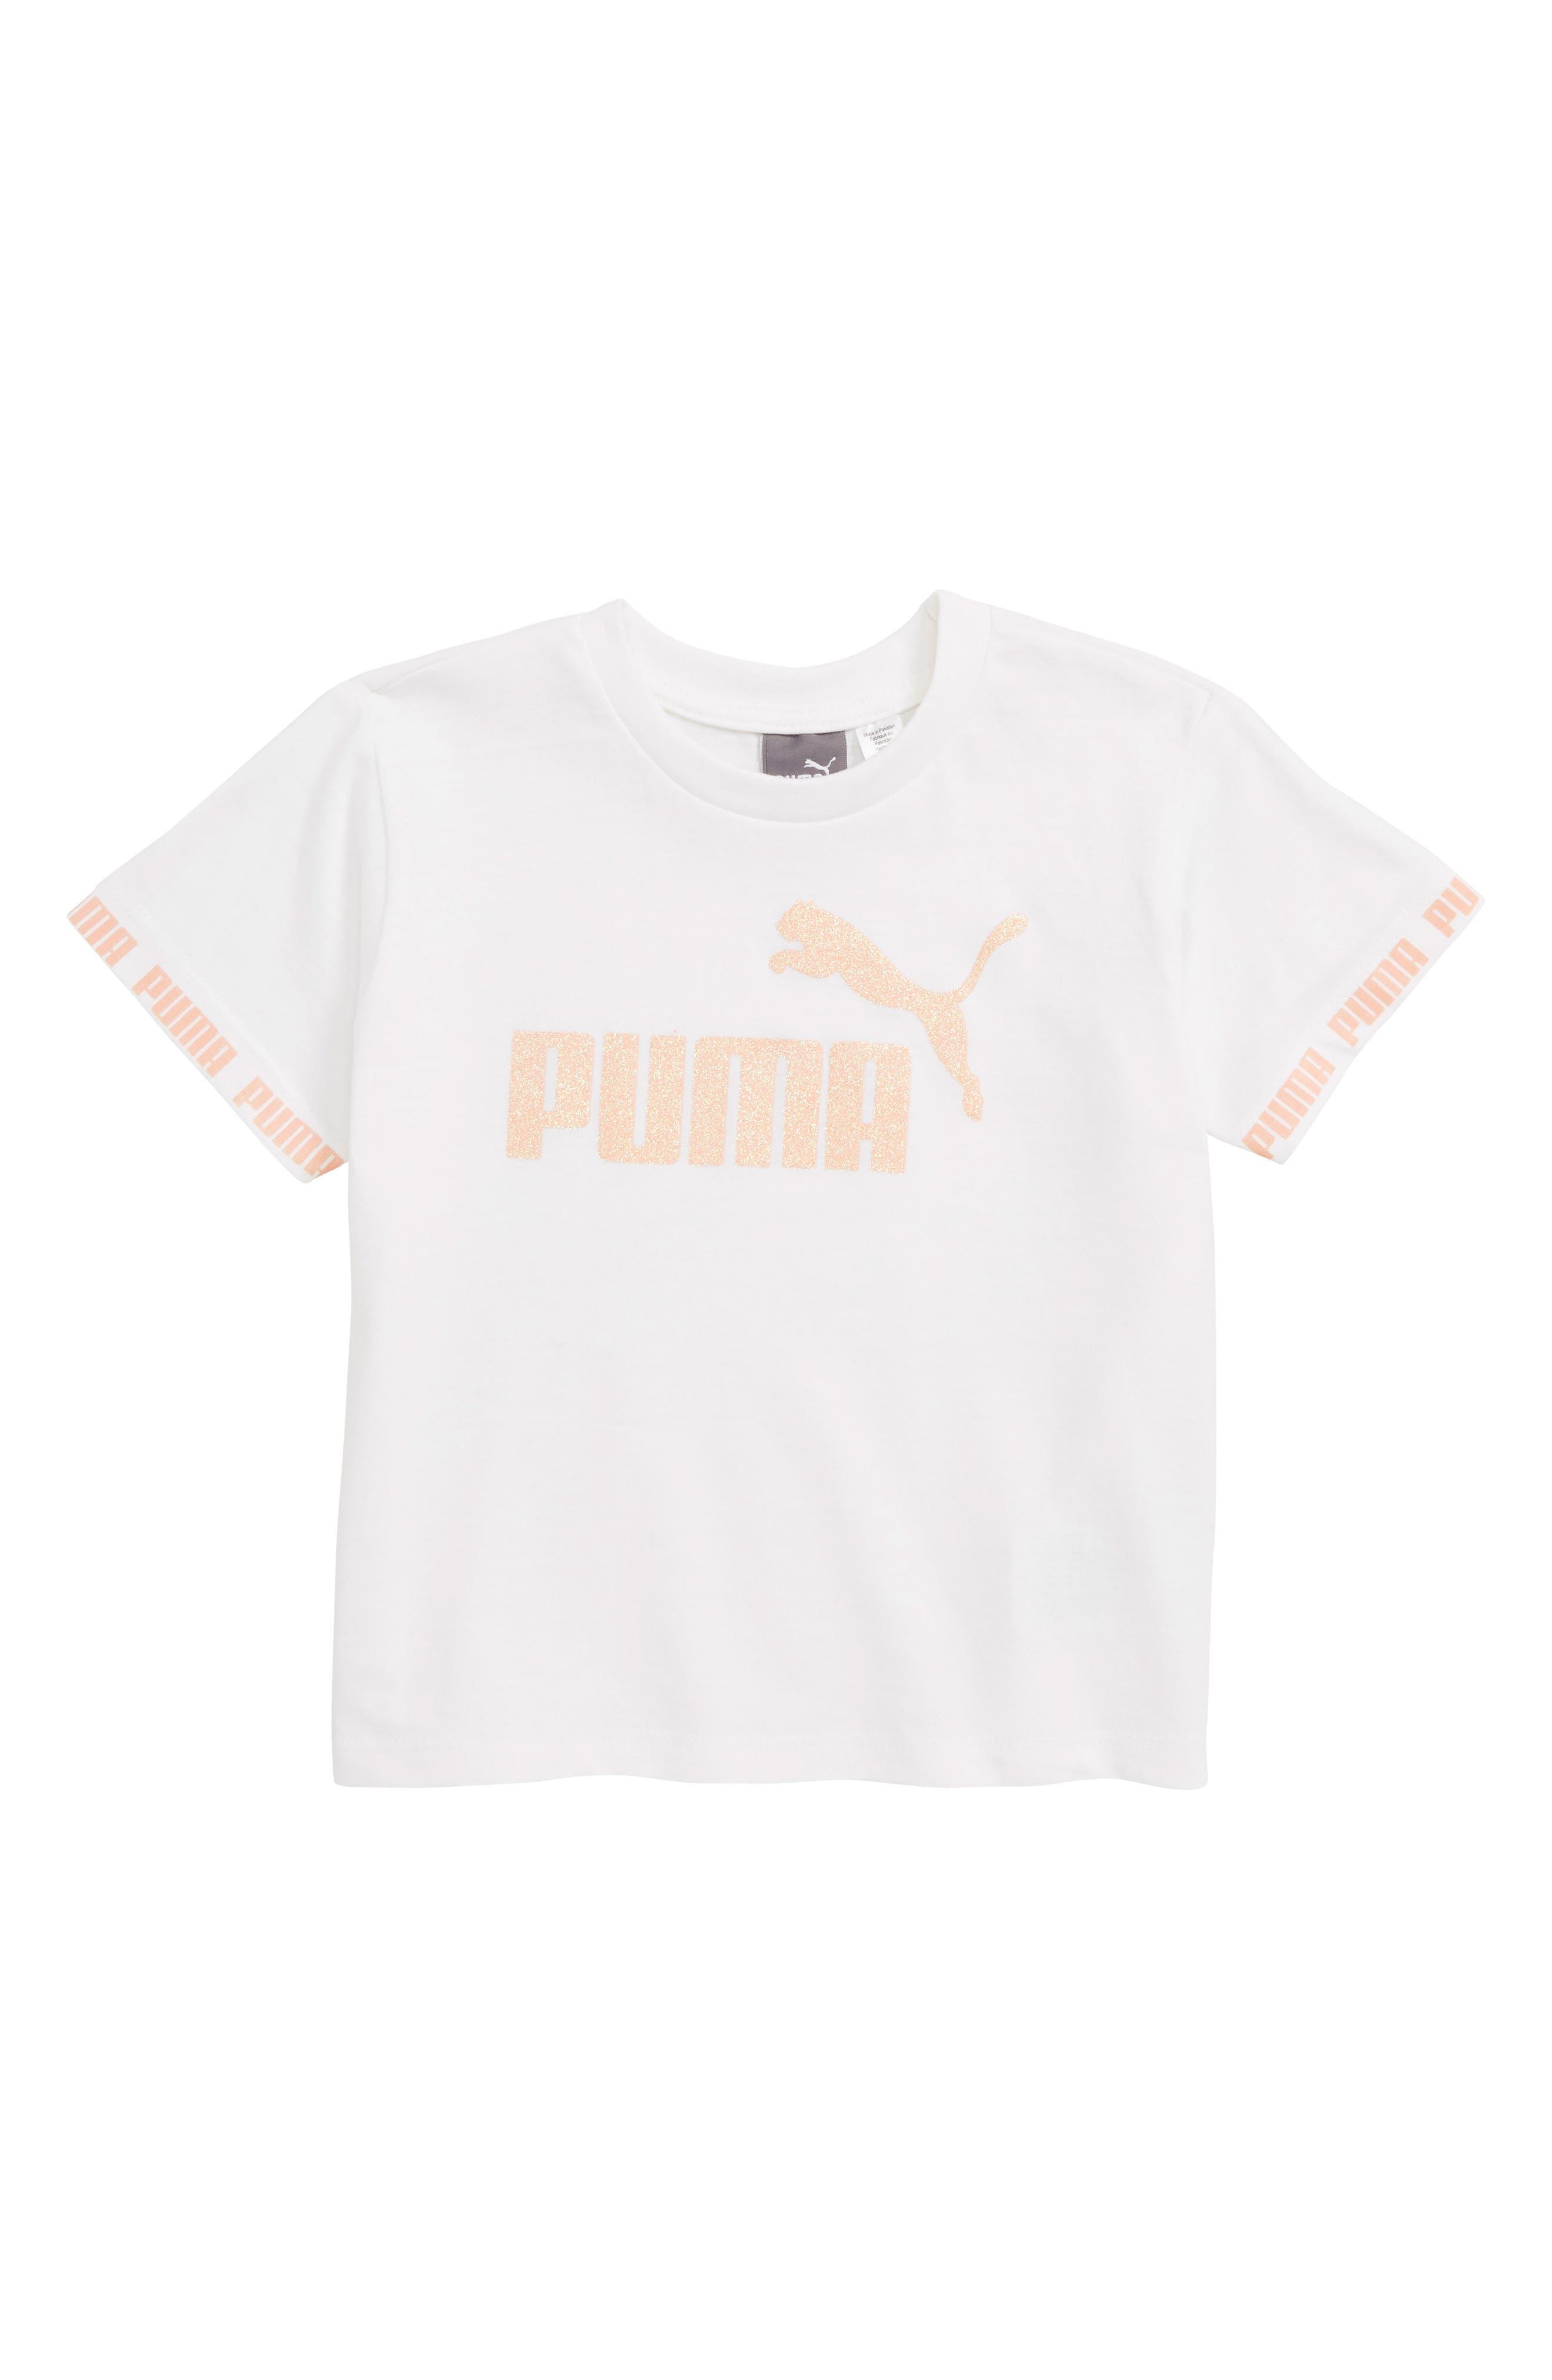 PUMA Amplified Logo Tee, Main, color, 100